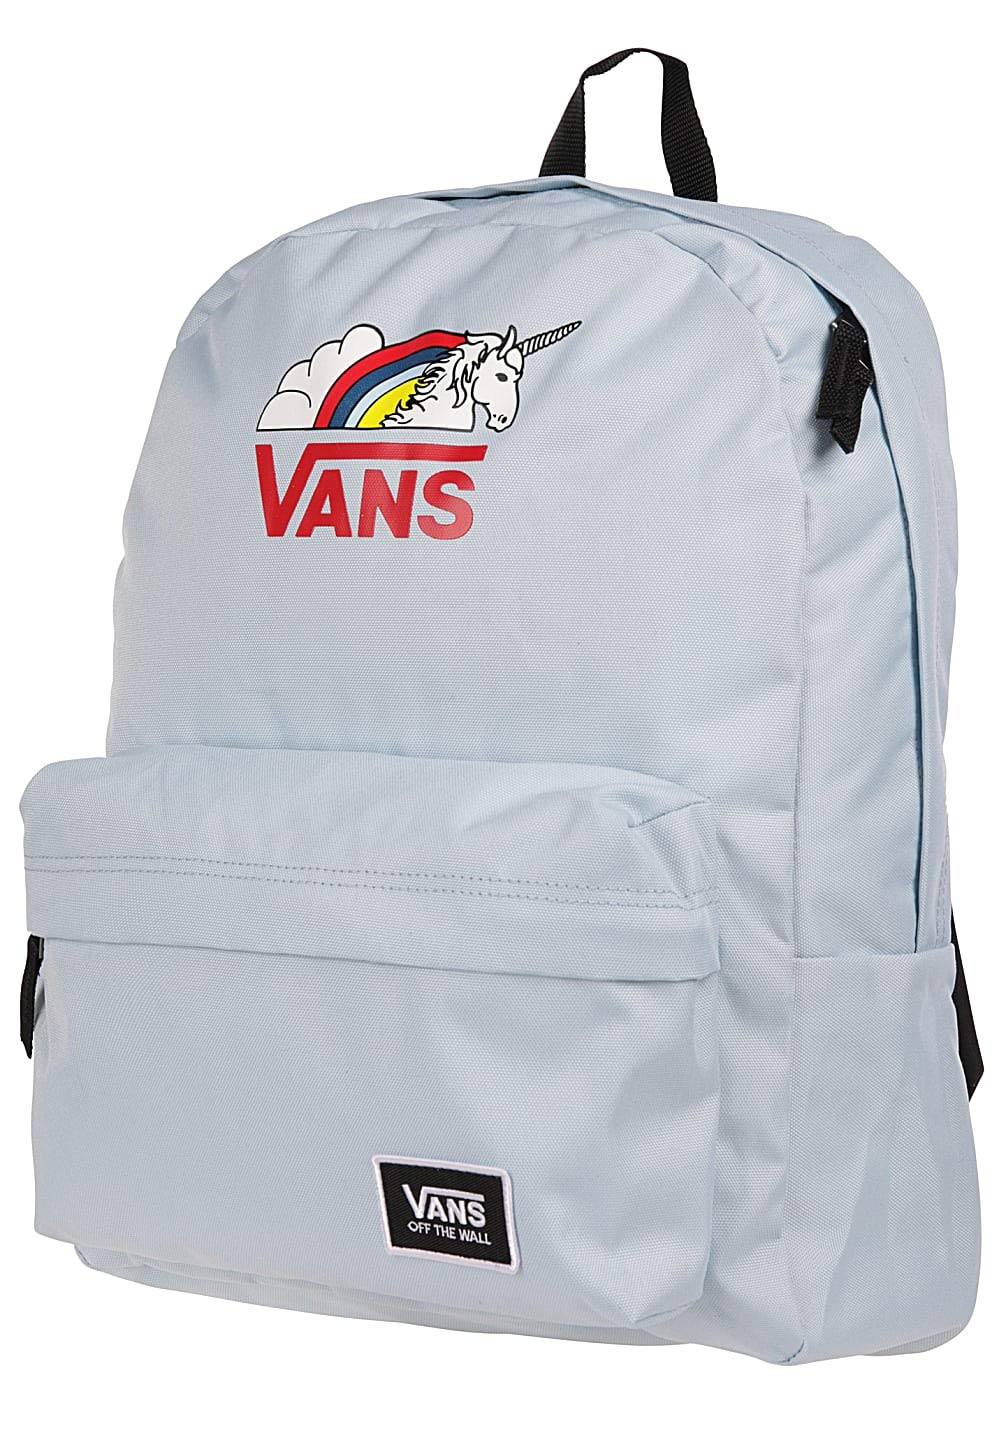 VANS Realm Classic Backpack Mochila  Amazon.es  Zapatos y complementos a44e395aa2d